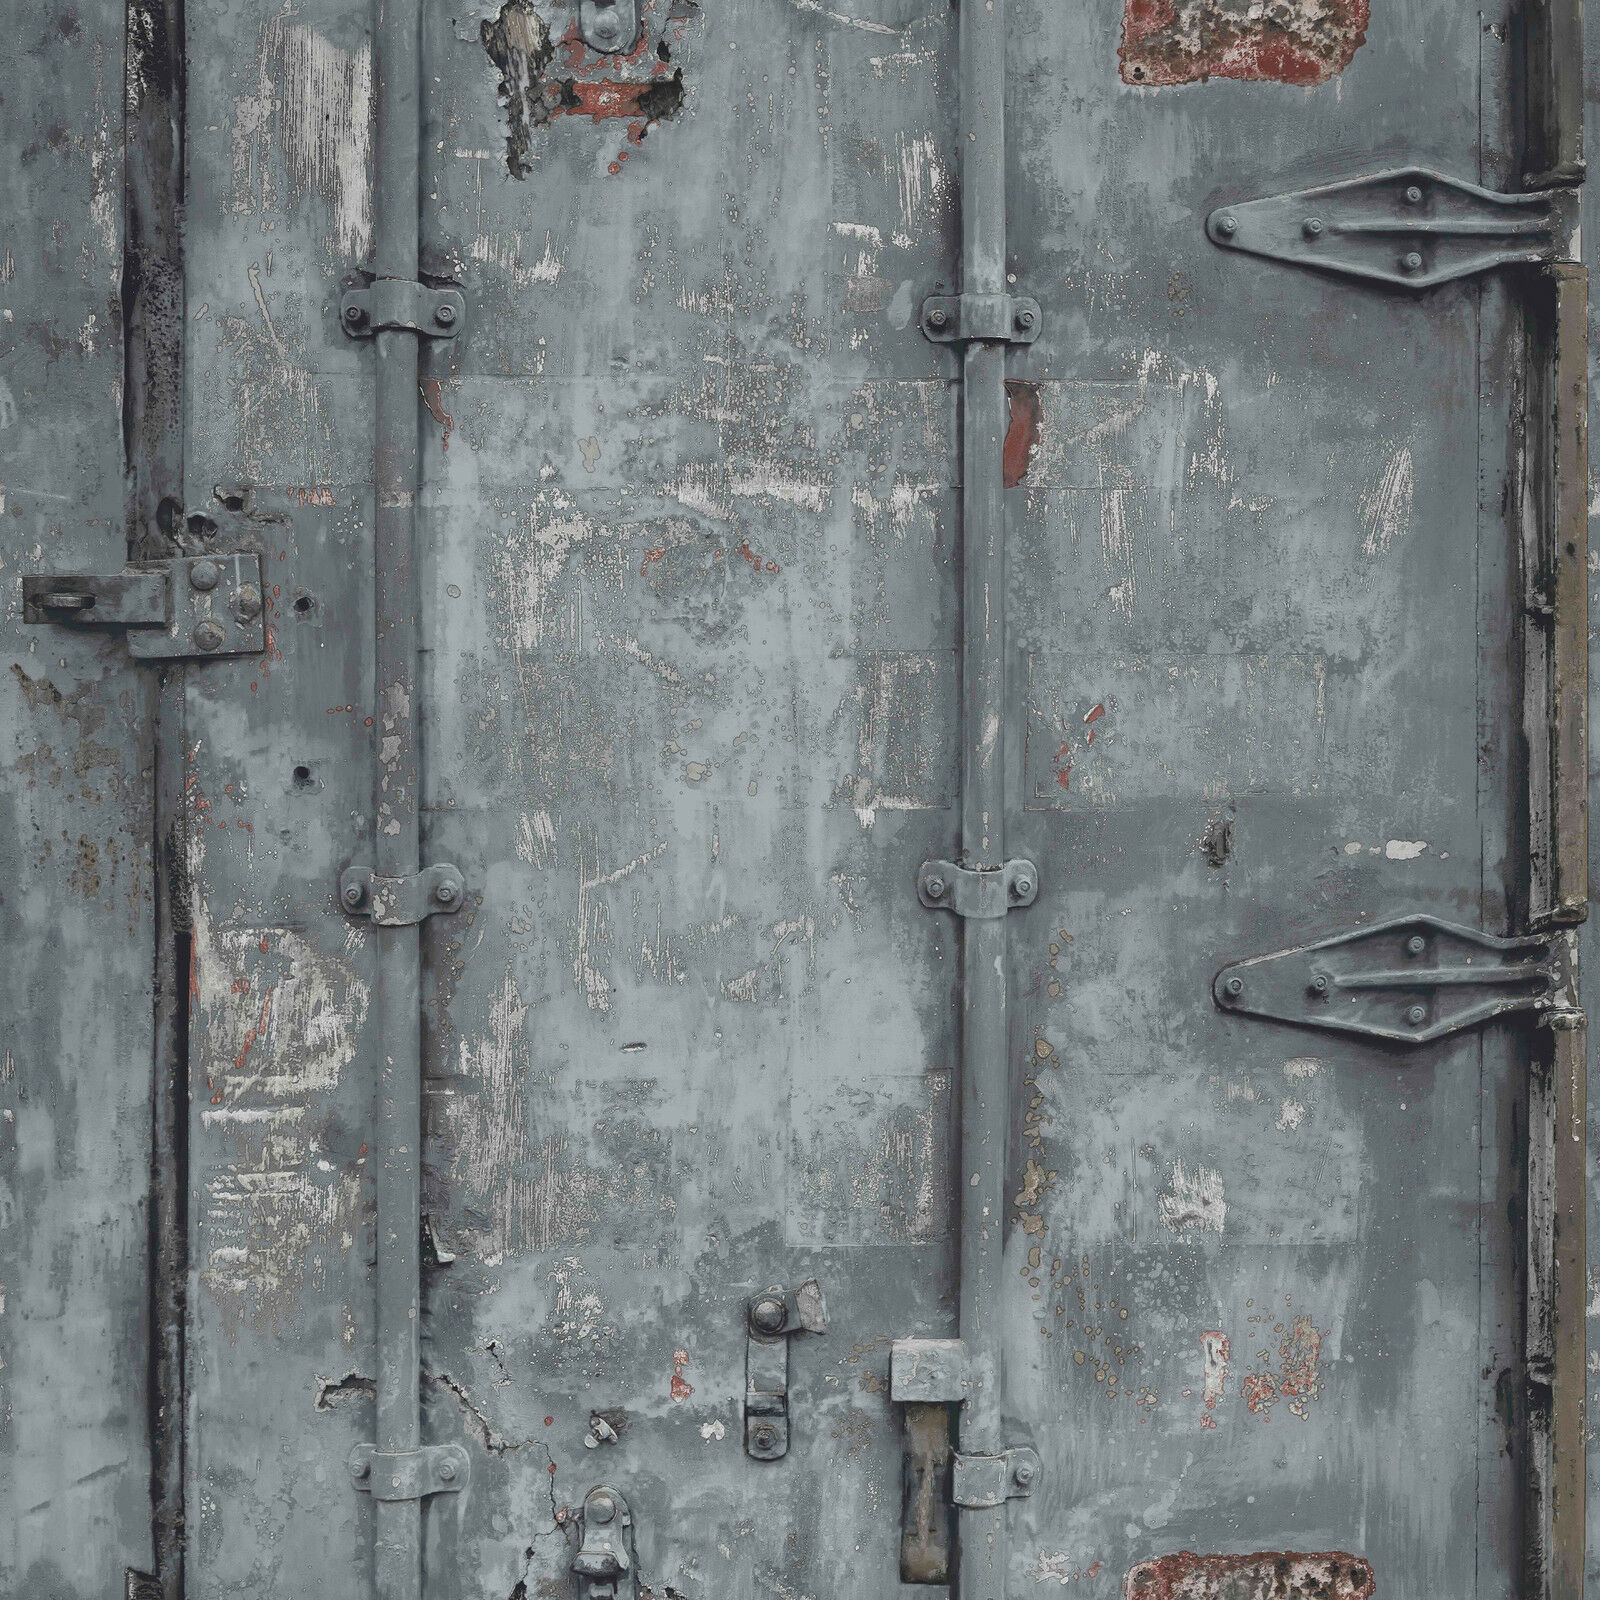 Vlies Tapete Stahl Container Optik Grau Verwittert Patina